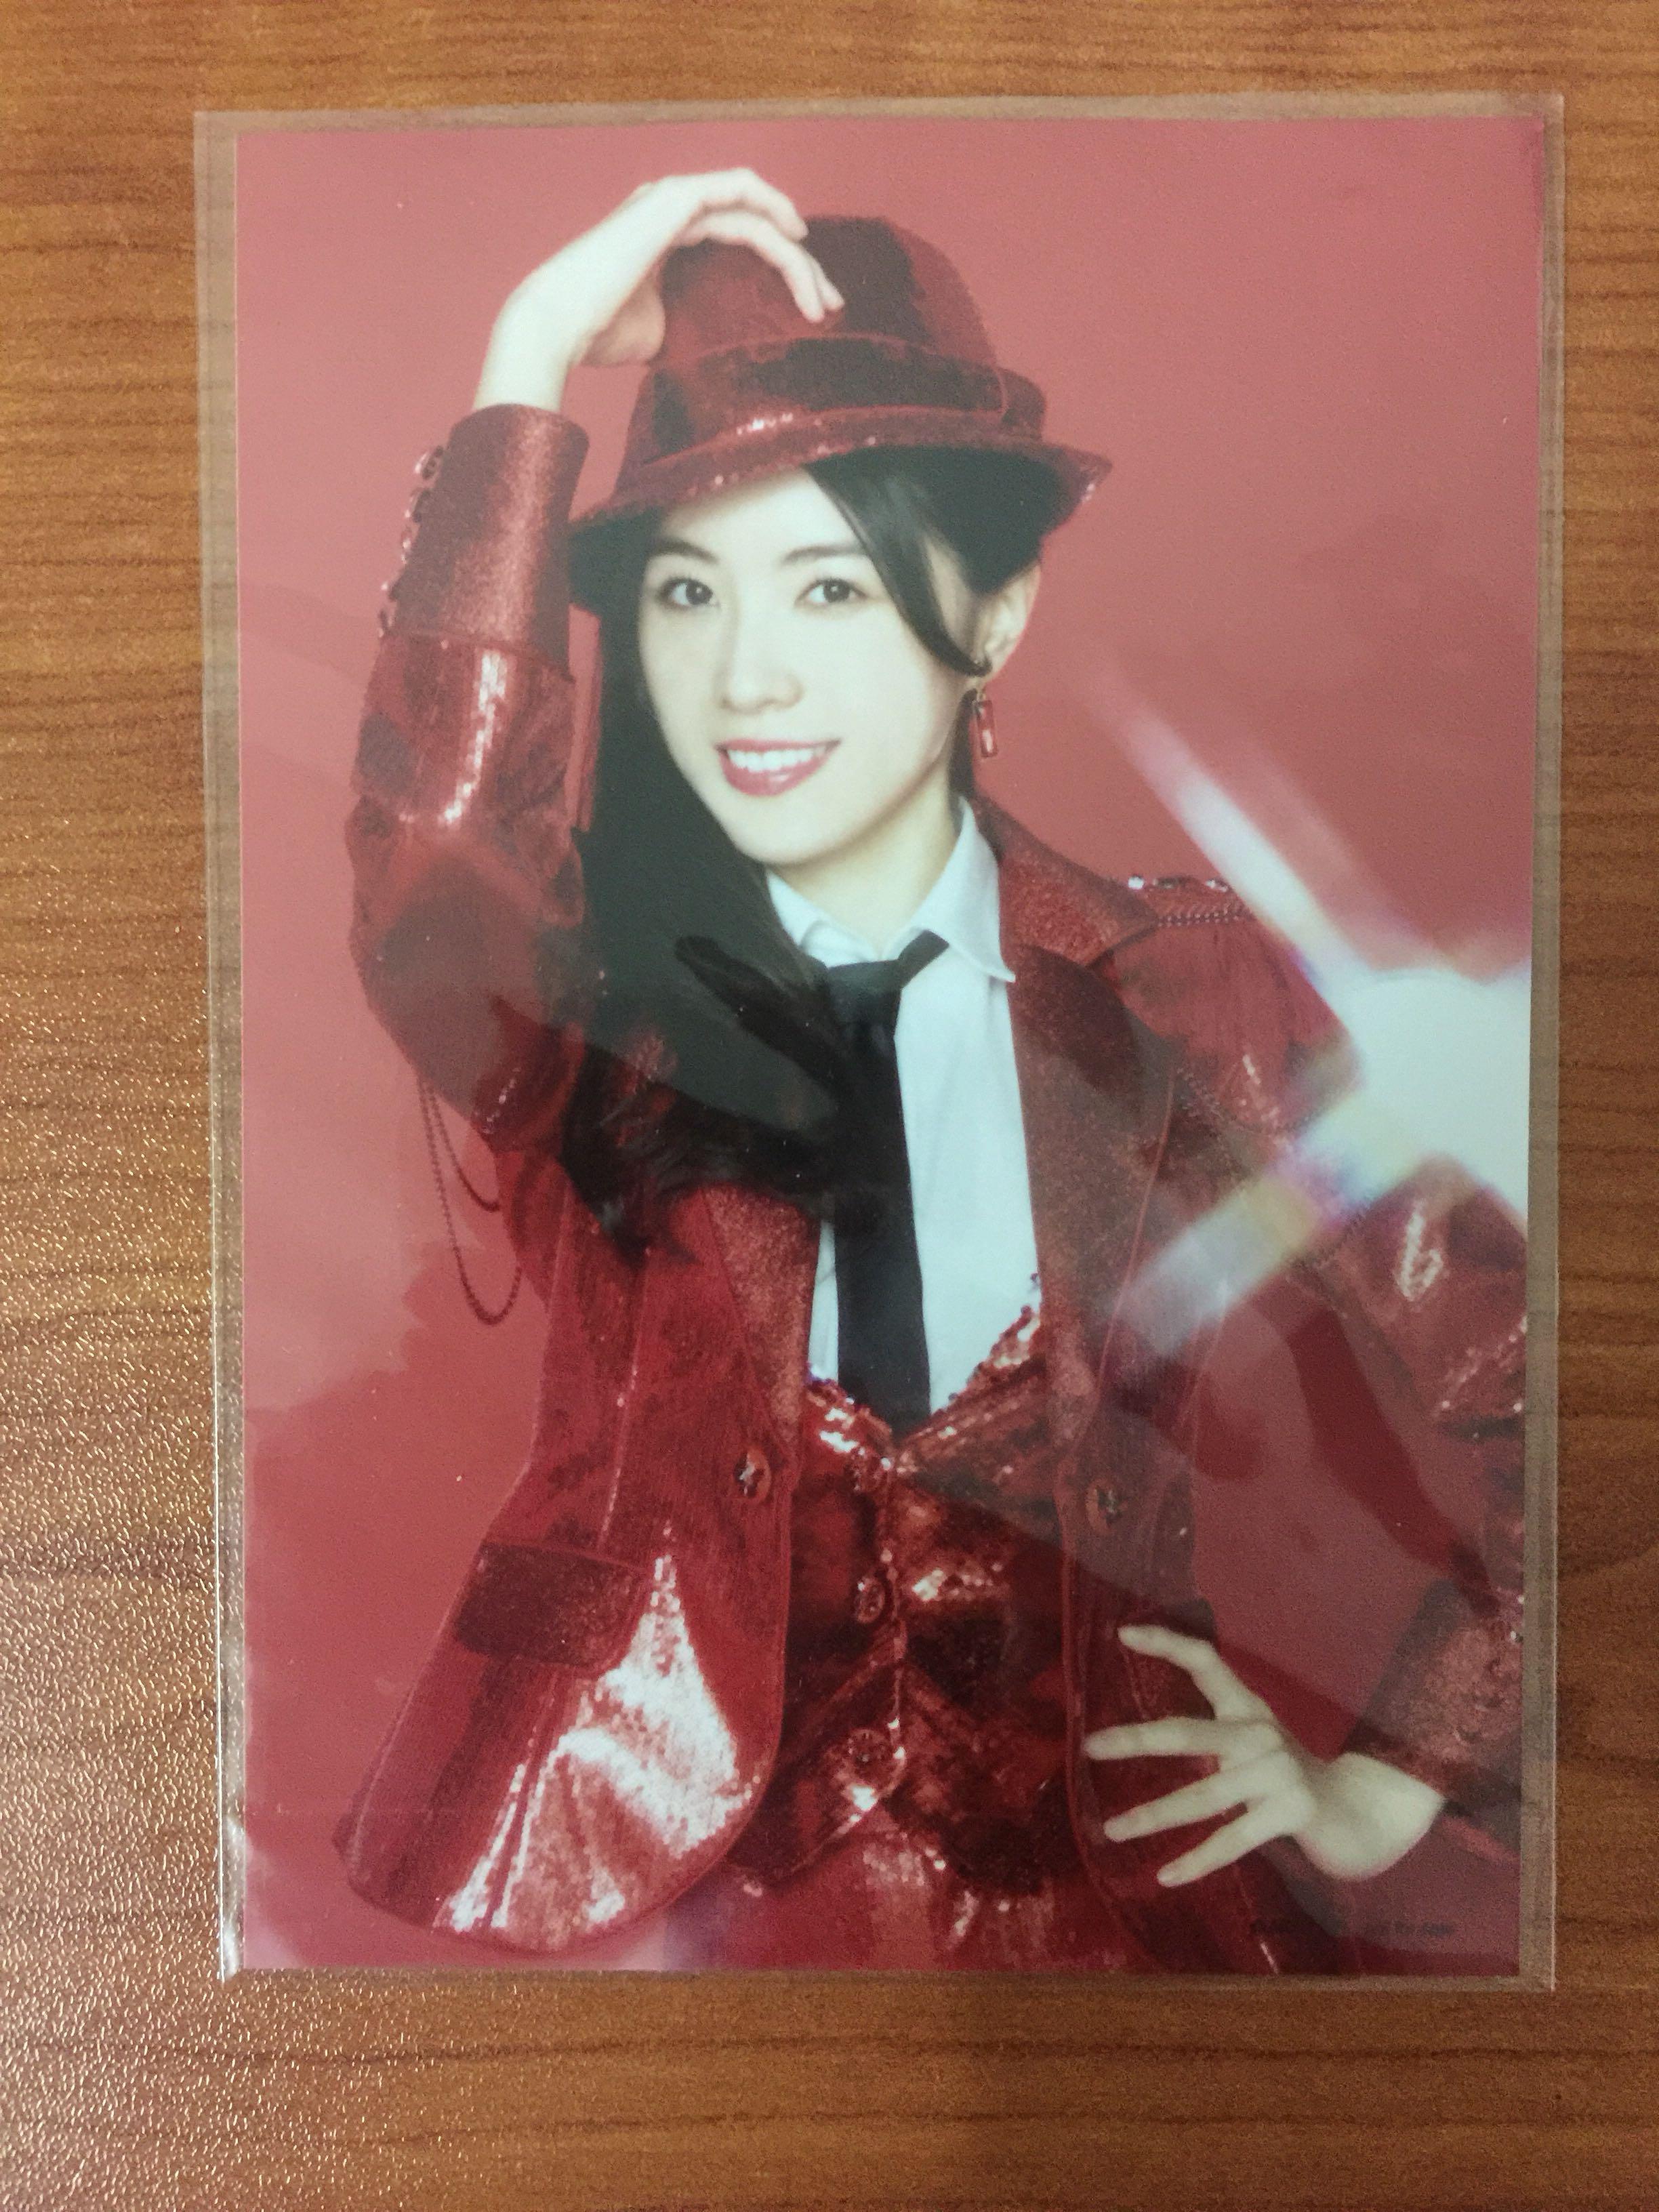 [WTS]SKE48 photo